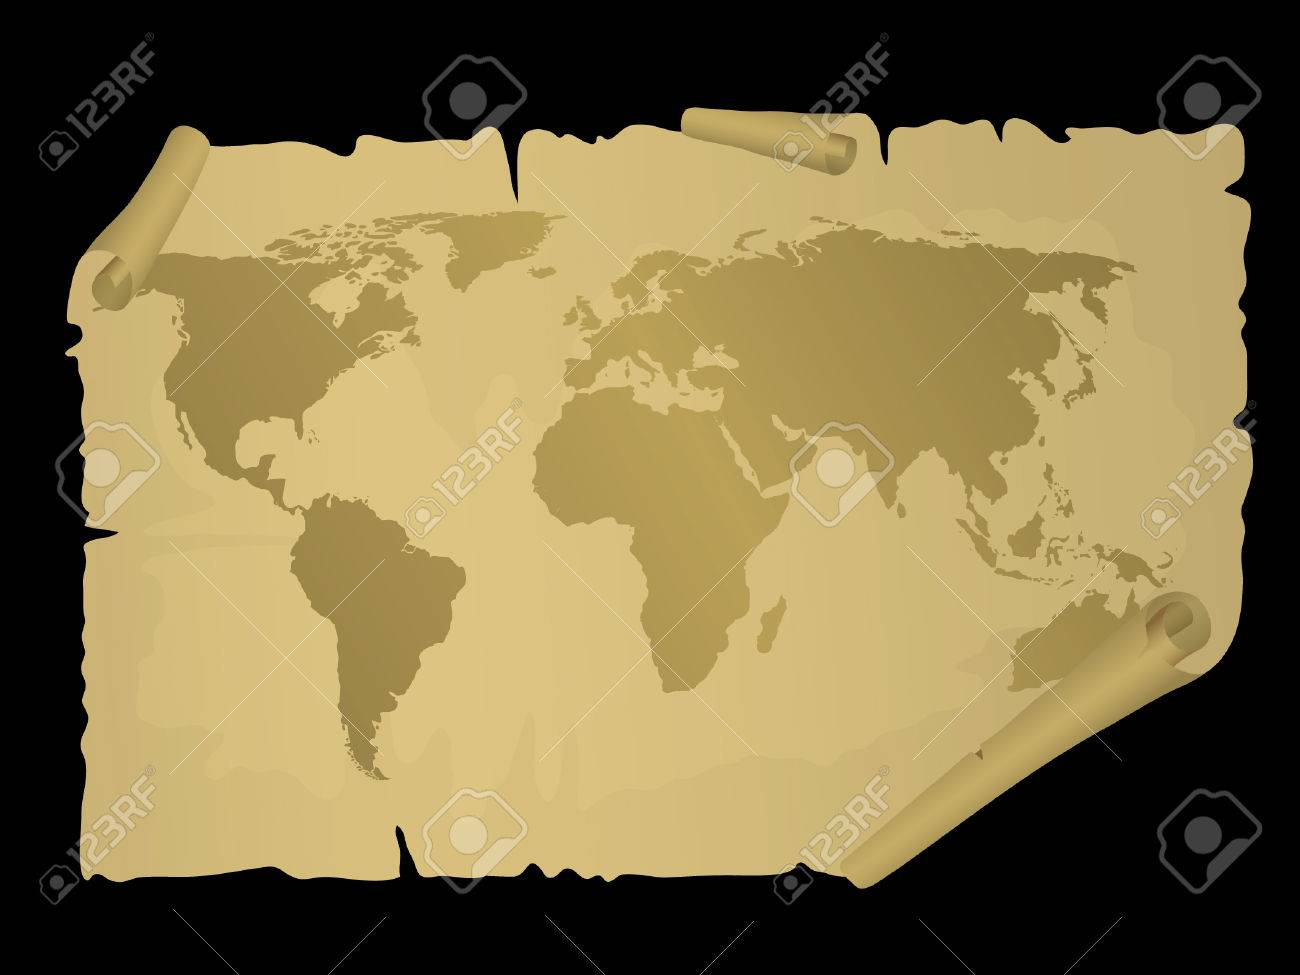 Vintage world map vector illustration royalty free cliparts vector vintage world map vector illustration gumiabroncs Images